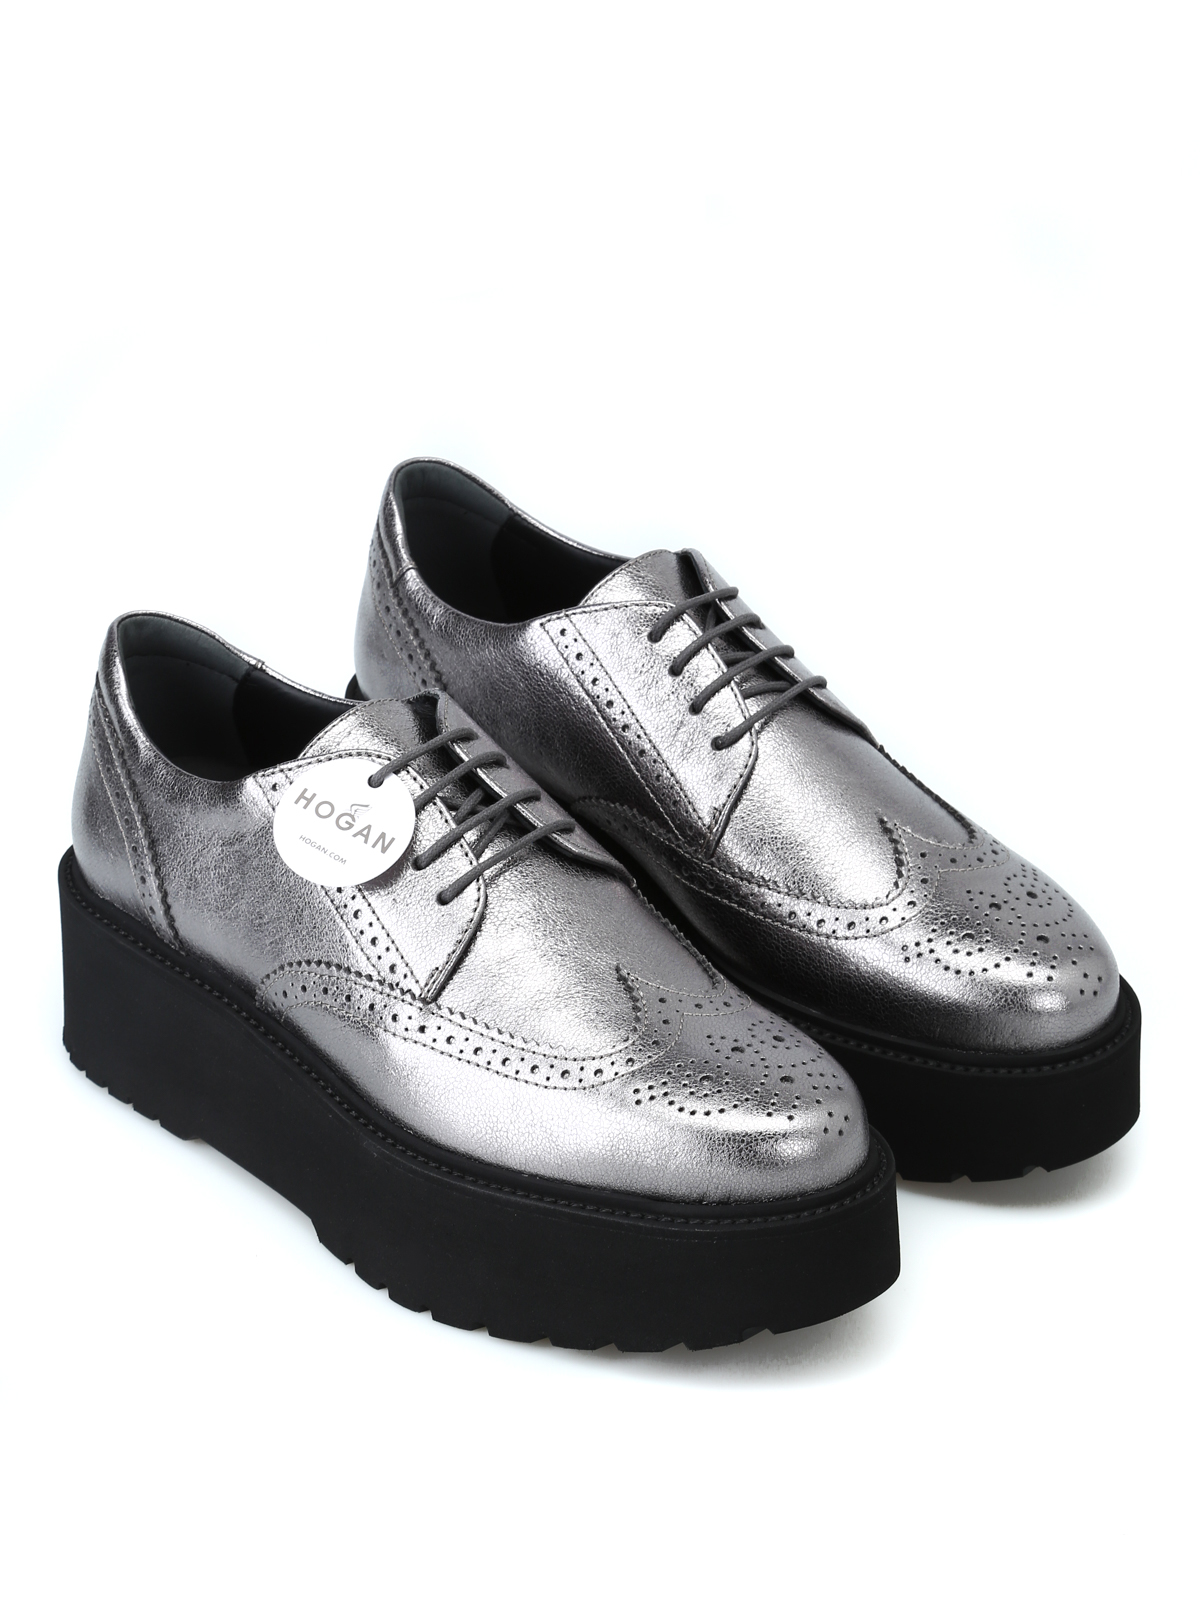 on sale eb5c9 1f712 Hogan - Derby con plateau metallizzate - scarpe stringate ...